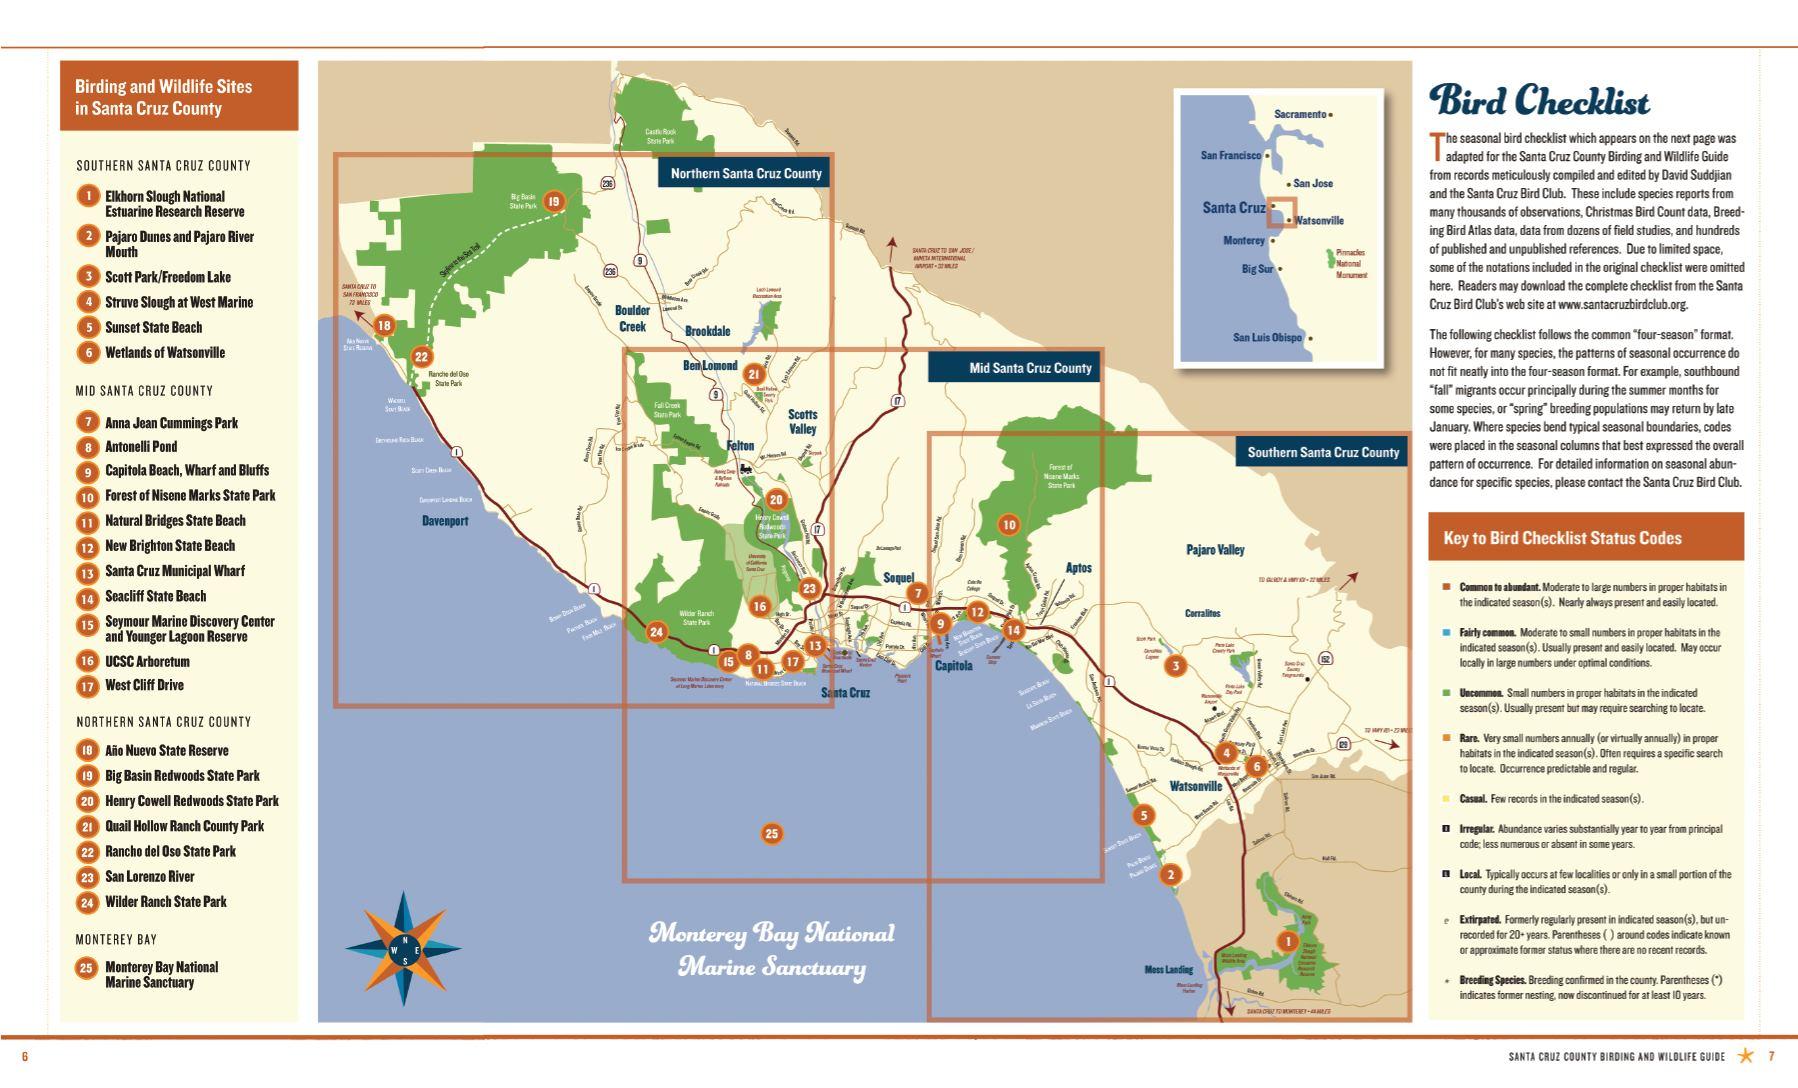 Birding Guide 2016 map